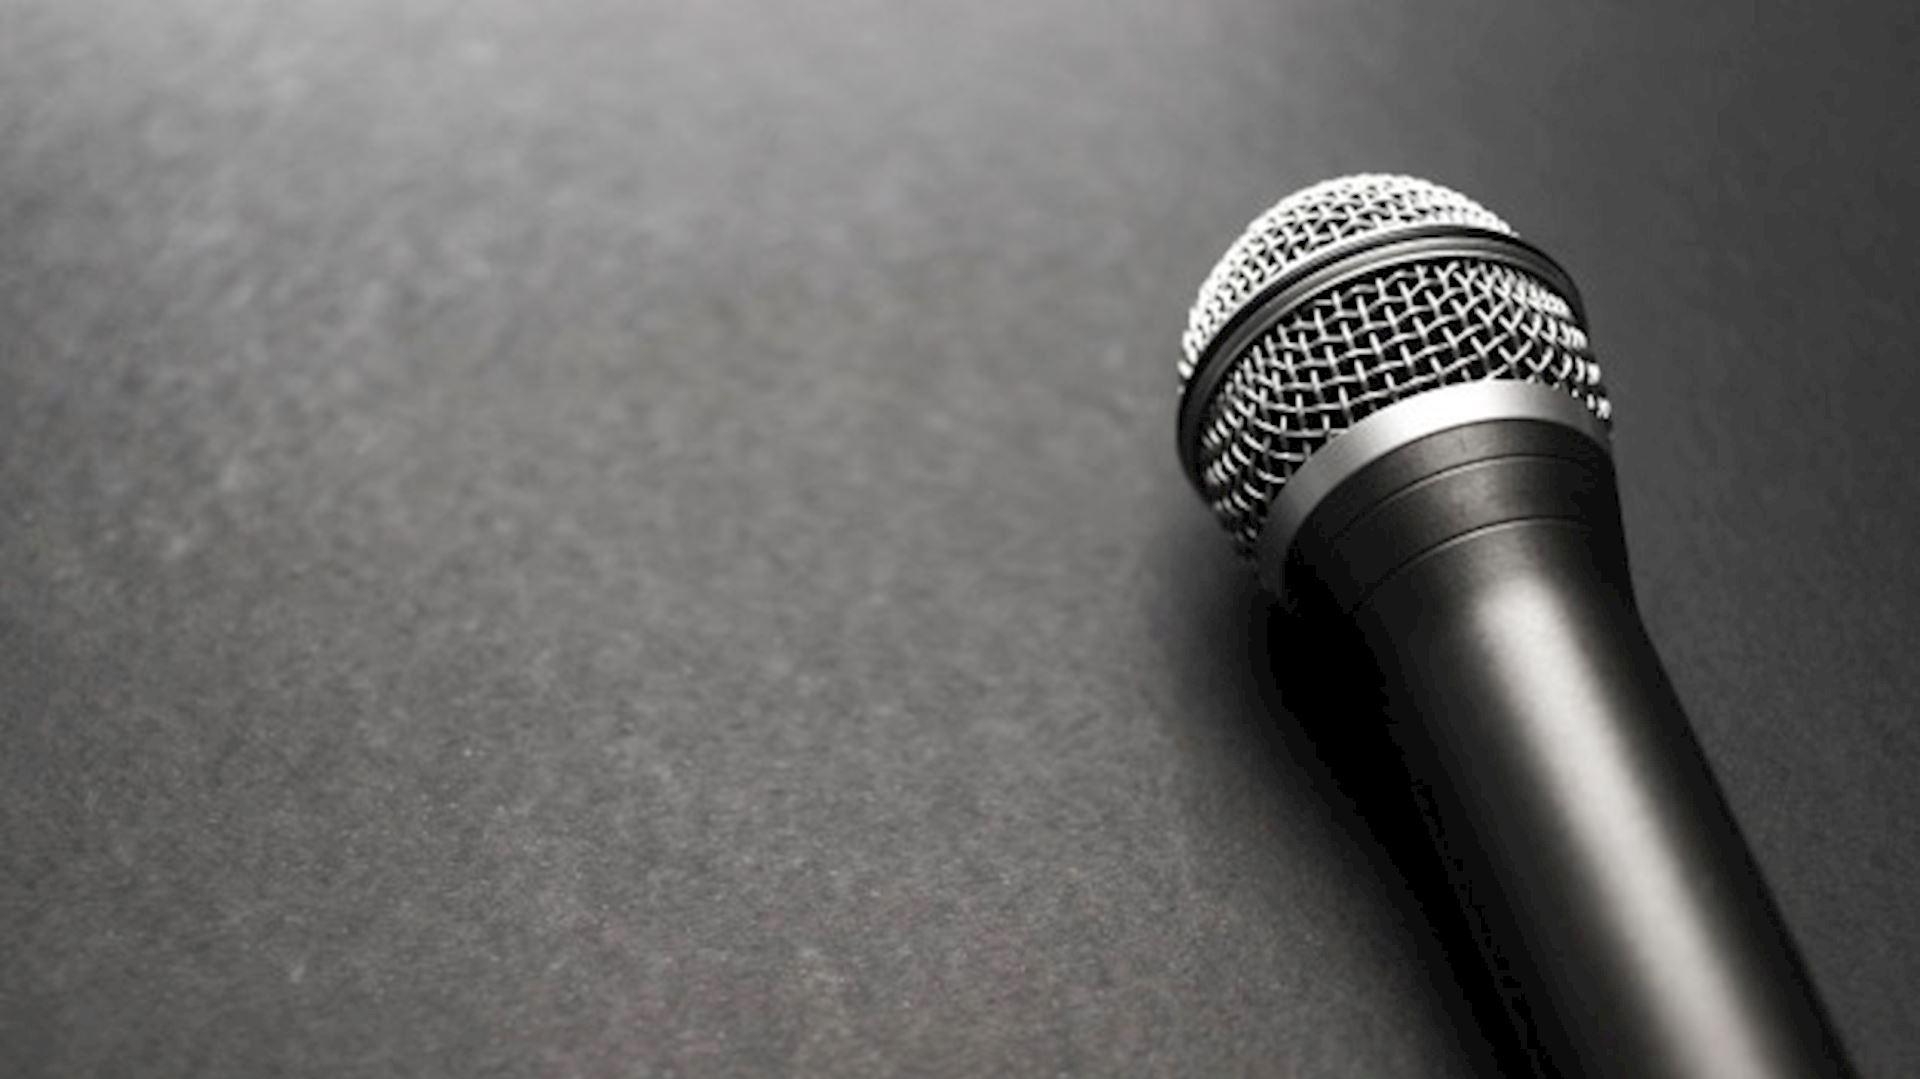 Микрофон на черном фоне картинки